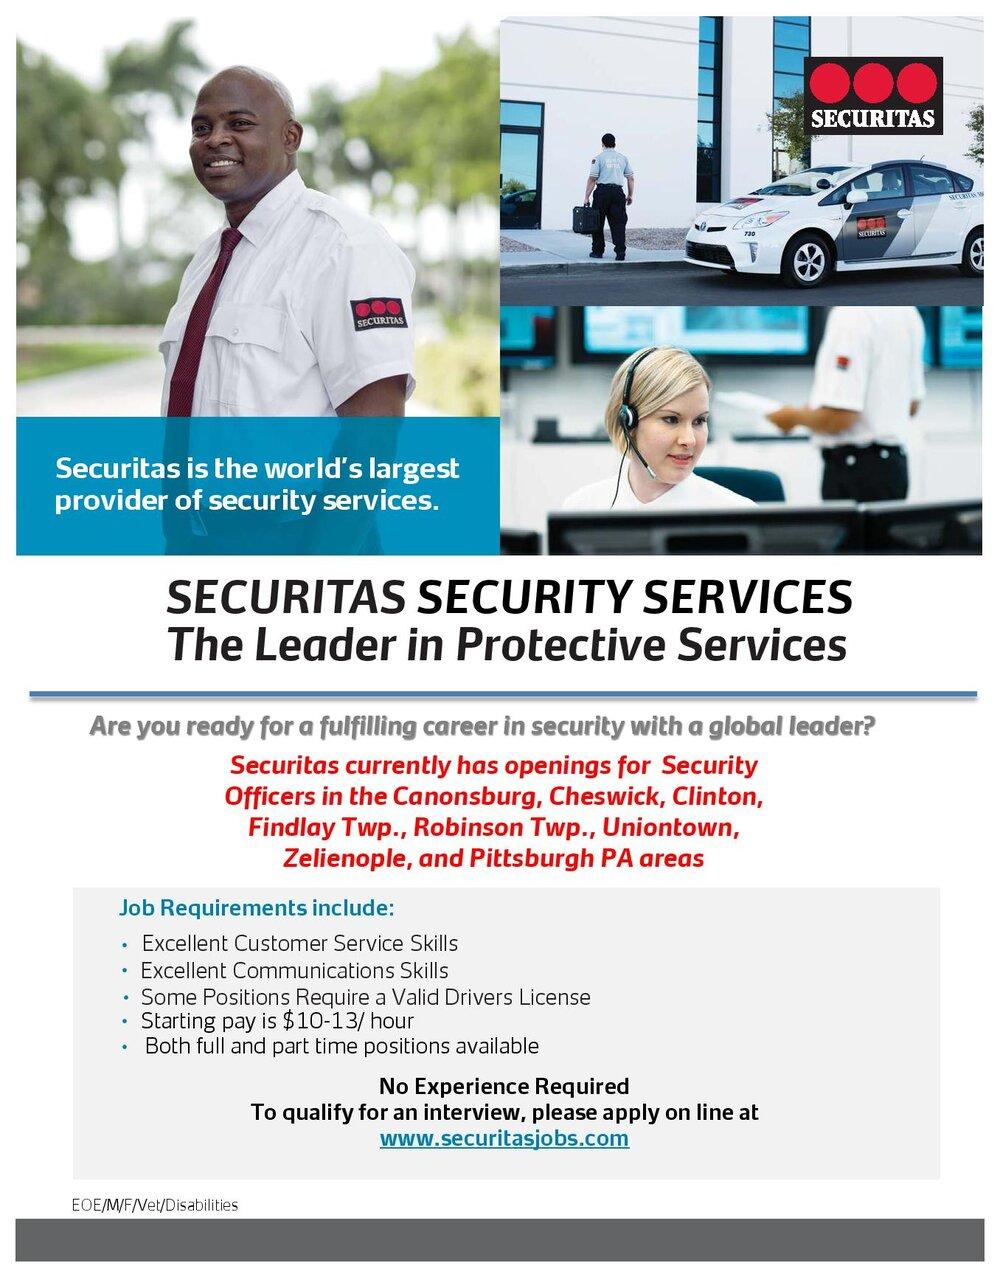 Securitas Recruiting - Security Officer-Description-page-001.jpg